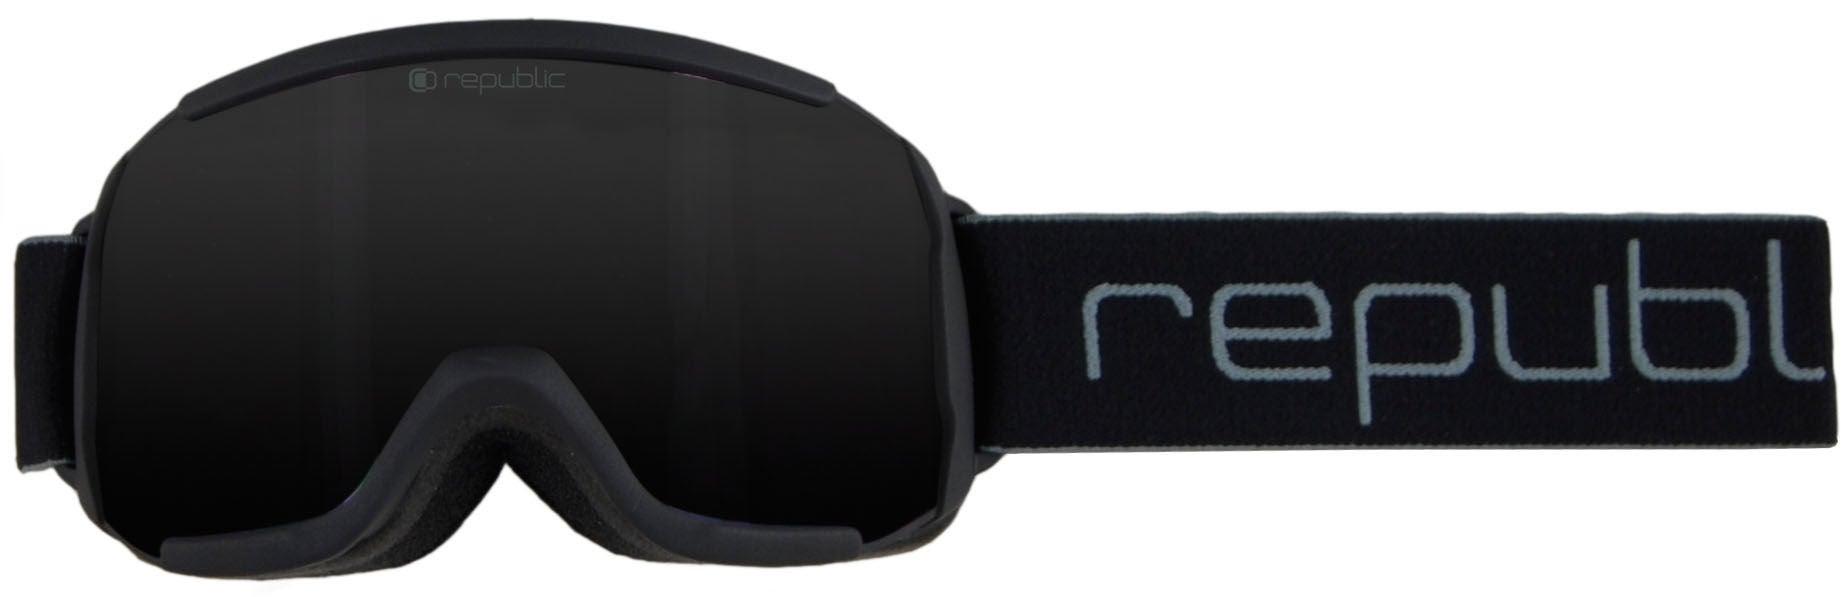 Republic R710 Skidglasögon Dam, Black